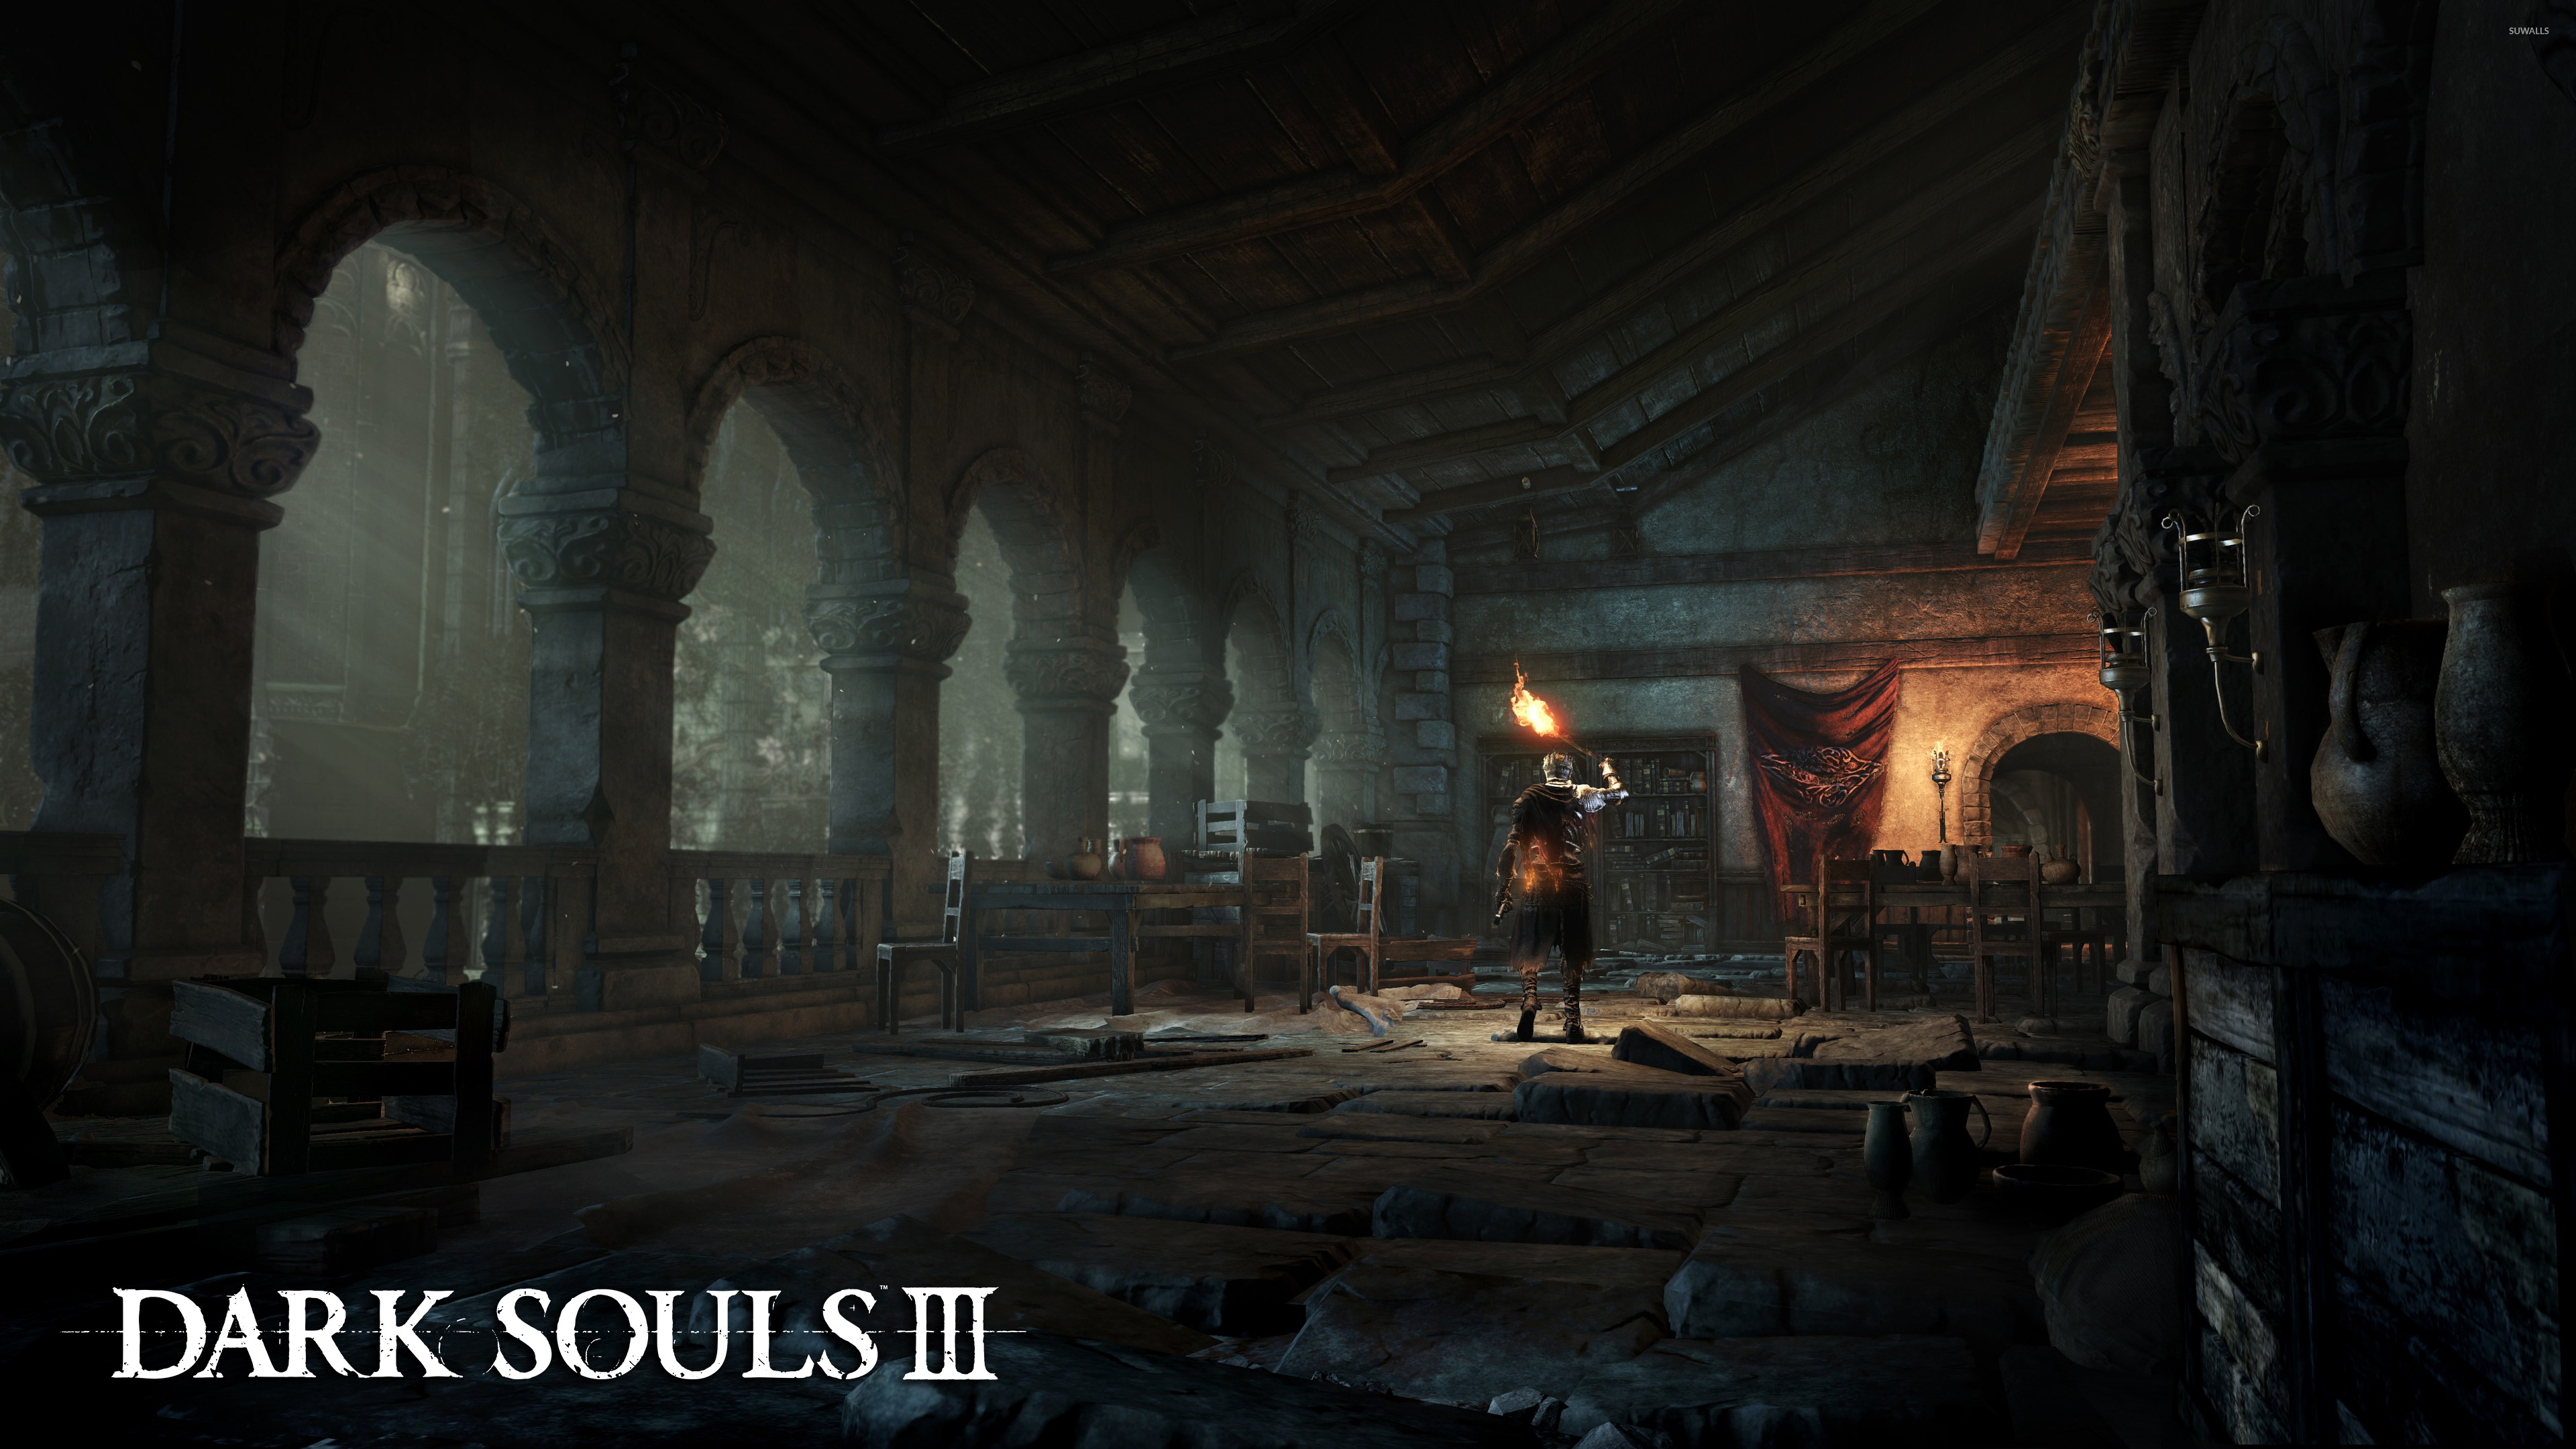 Knight in an empty room in dark souls iii wallpaper game for Black room wallpaper